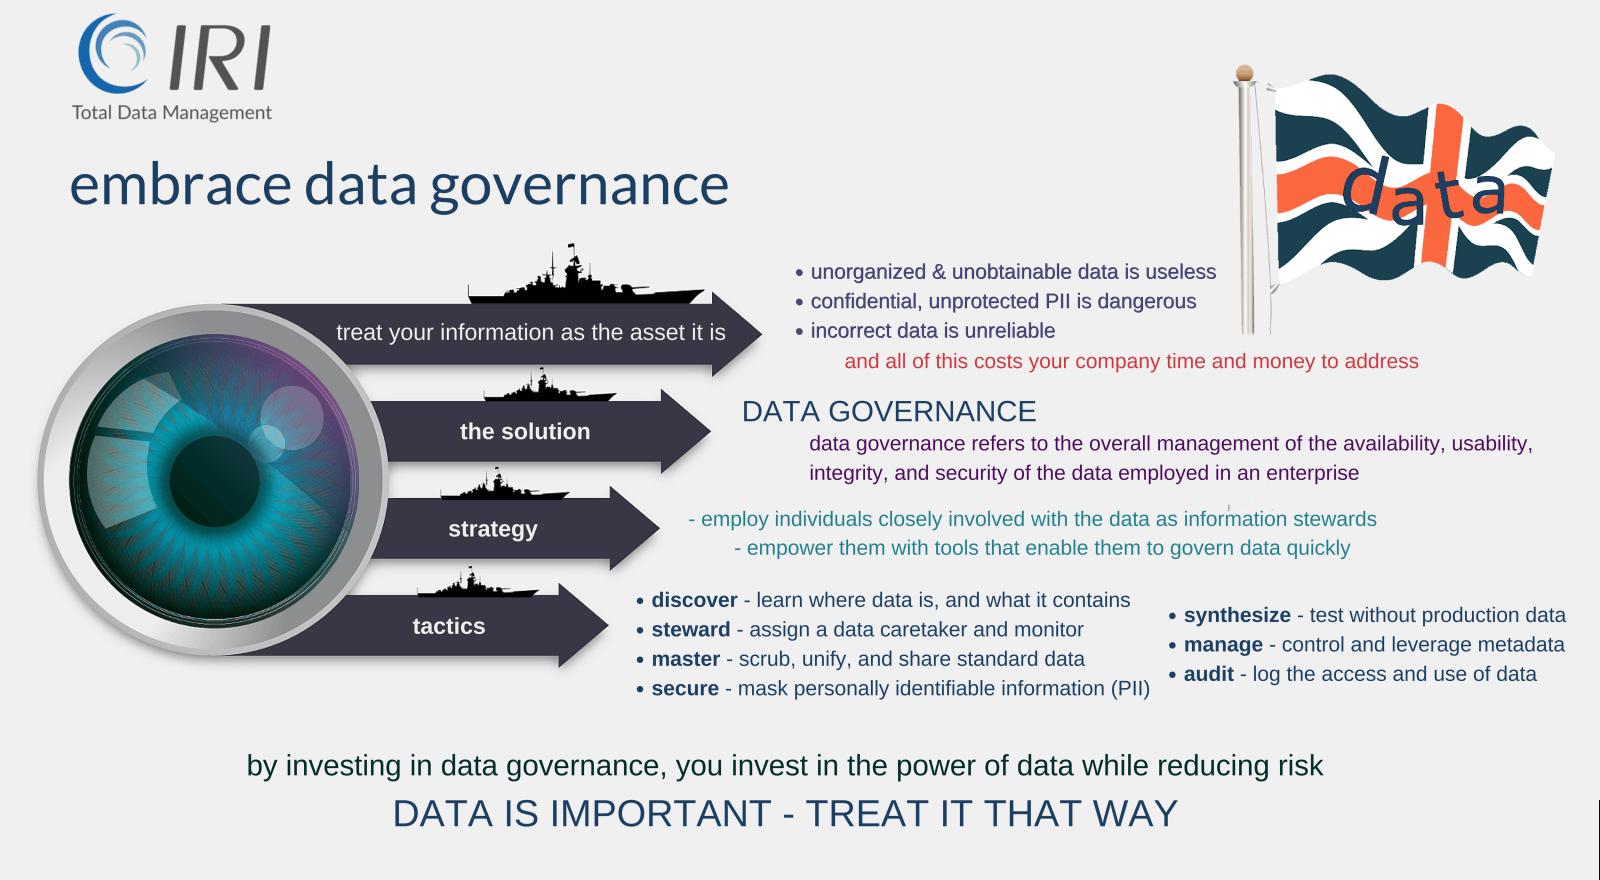 data governance description and benefits